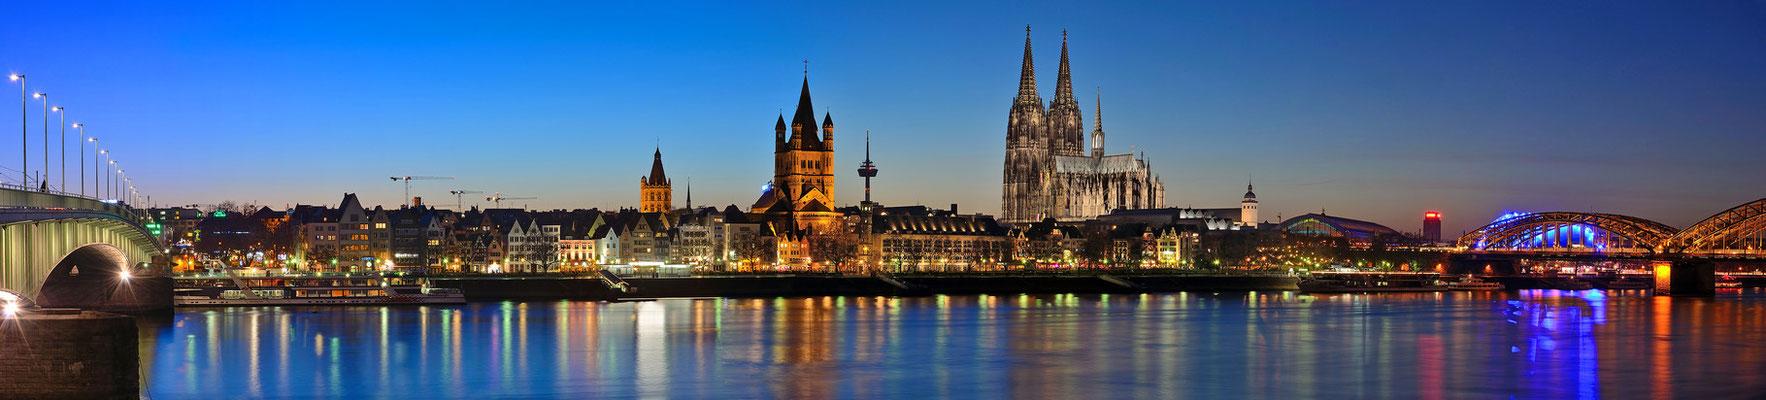 140° - Rheinufer in Köln - Deutzer Brücke - Kirche Gross St. Martin - Dom - Hohenzollernbrücke